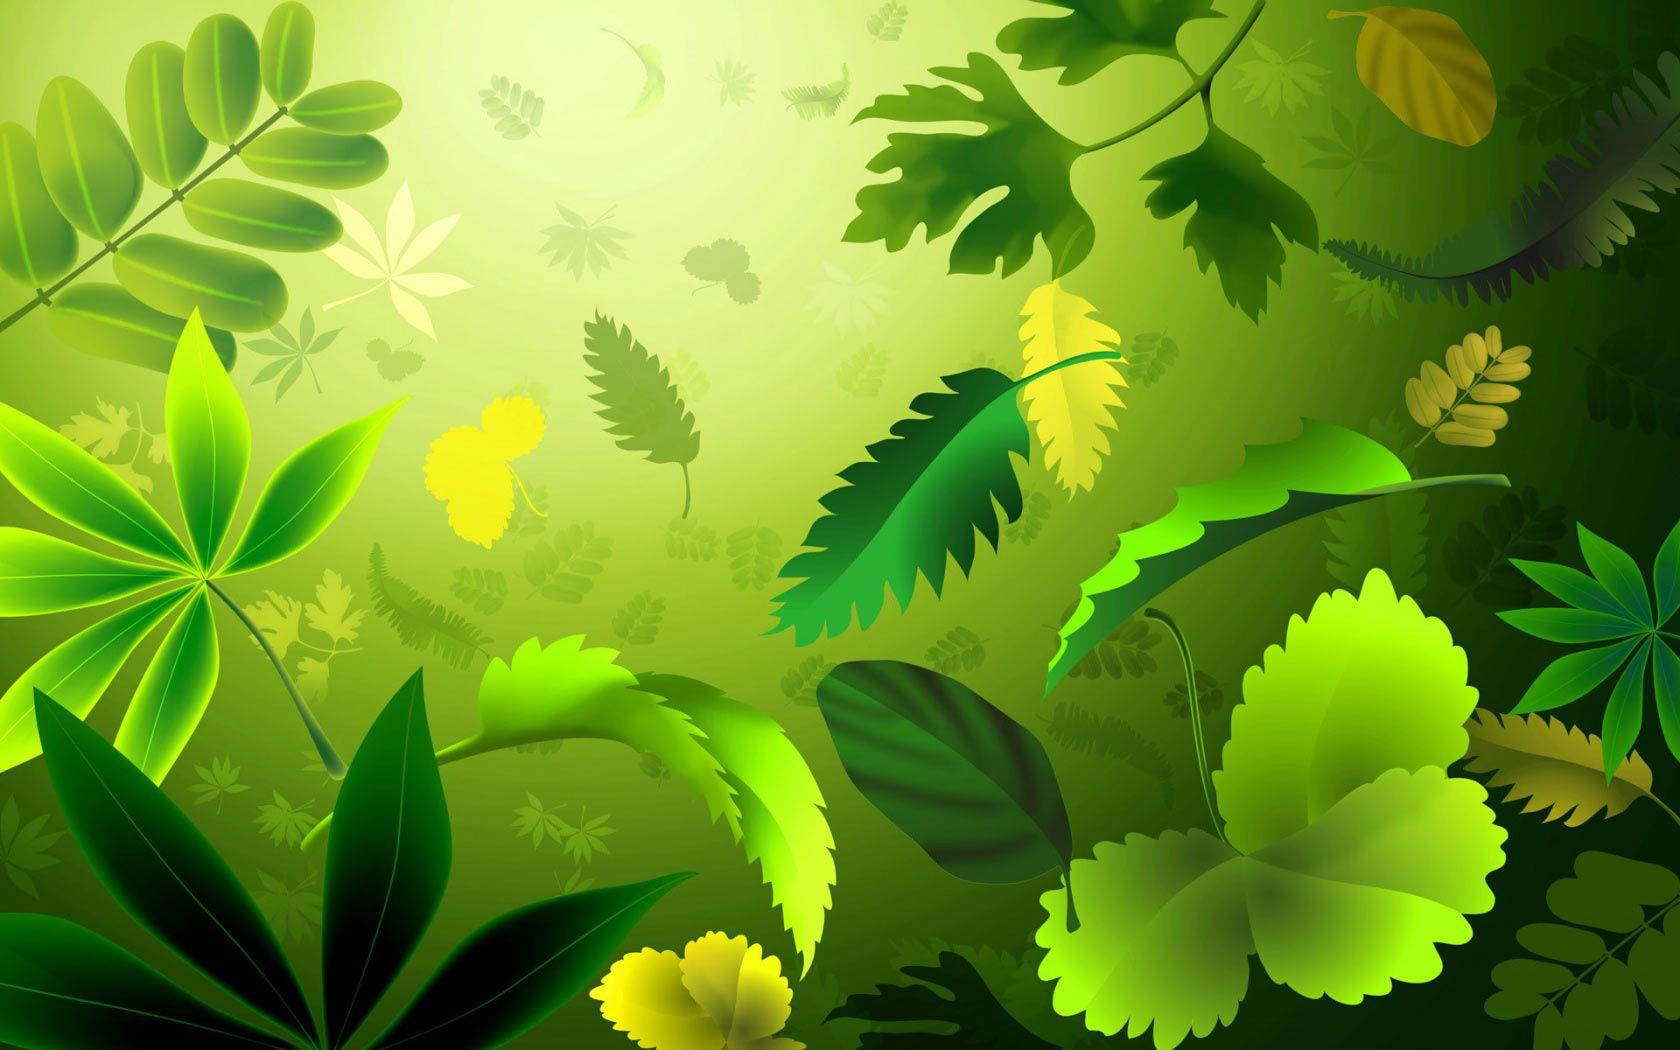 Free Nature Clipart Background Desktop Wallpaper Green Leaf Wallpaper Abstract Green Nature Wallpaper